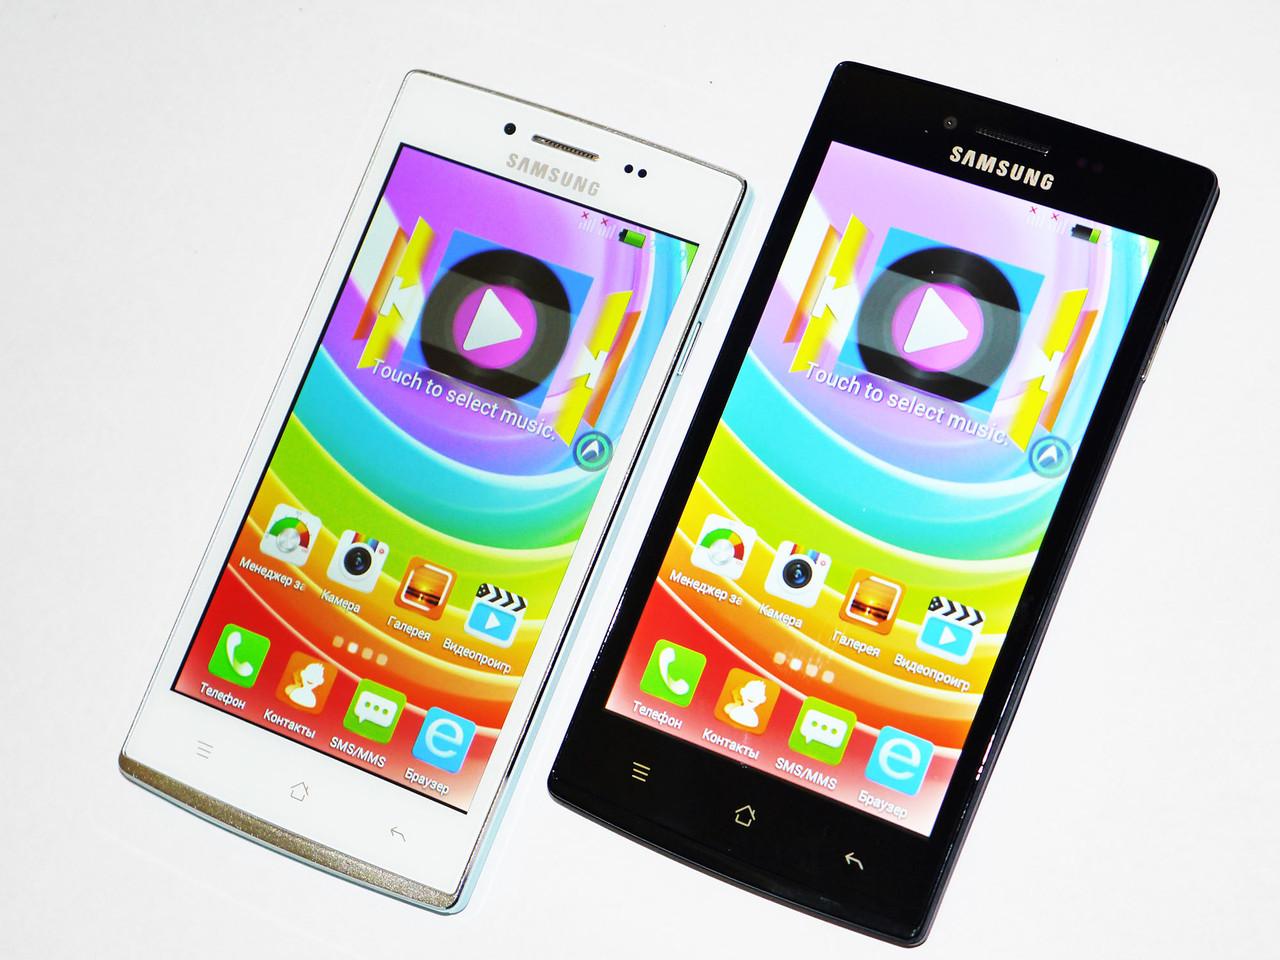 Телефон Samsung F7 - 2 сим, 2 батареи, 2 ядра, 5 Мп+ чехол, фото 1